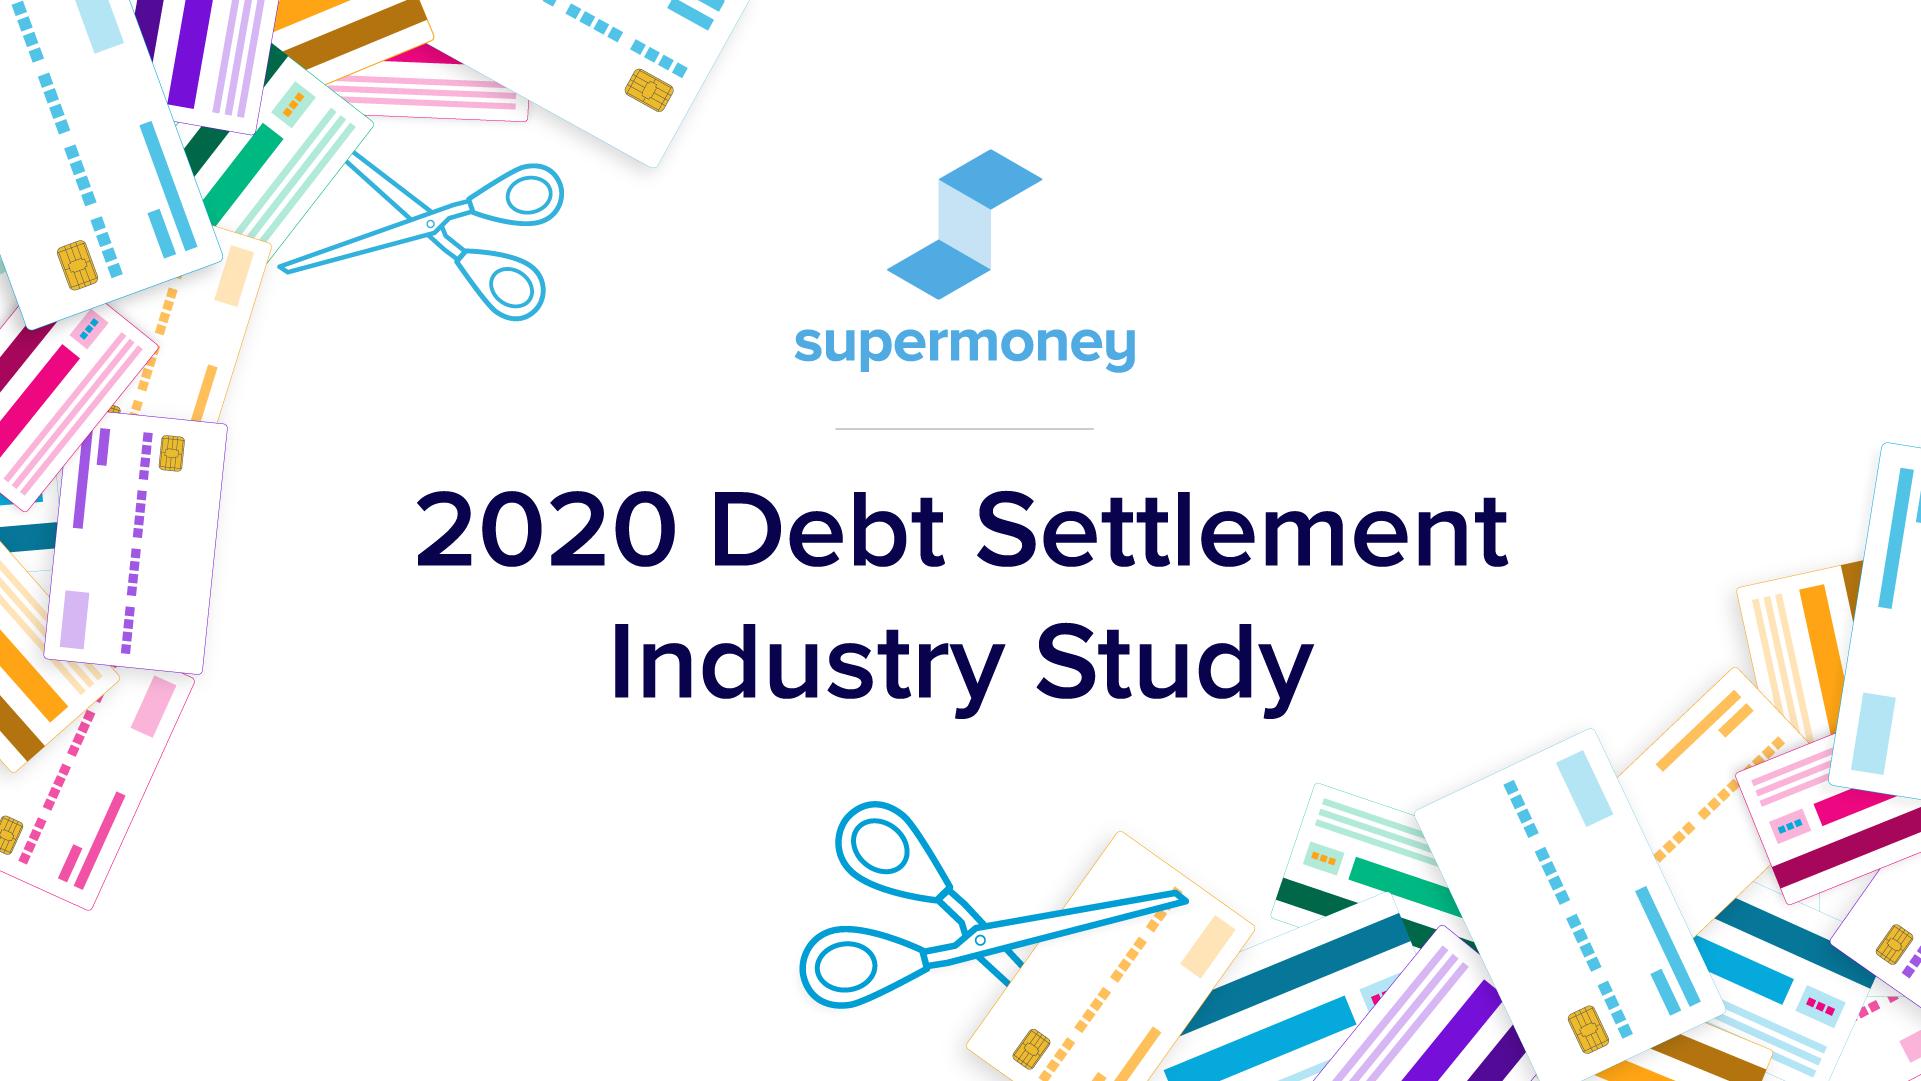 SuperMoney debt settlement